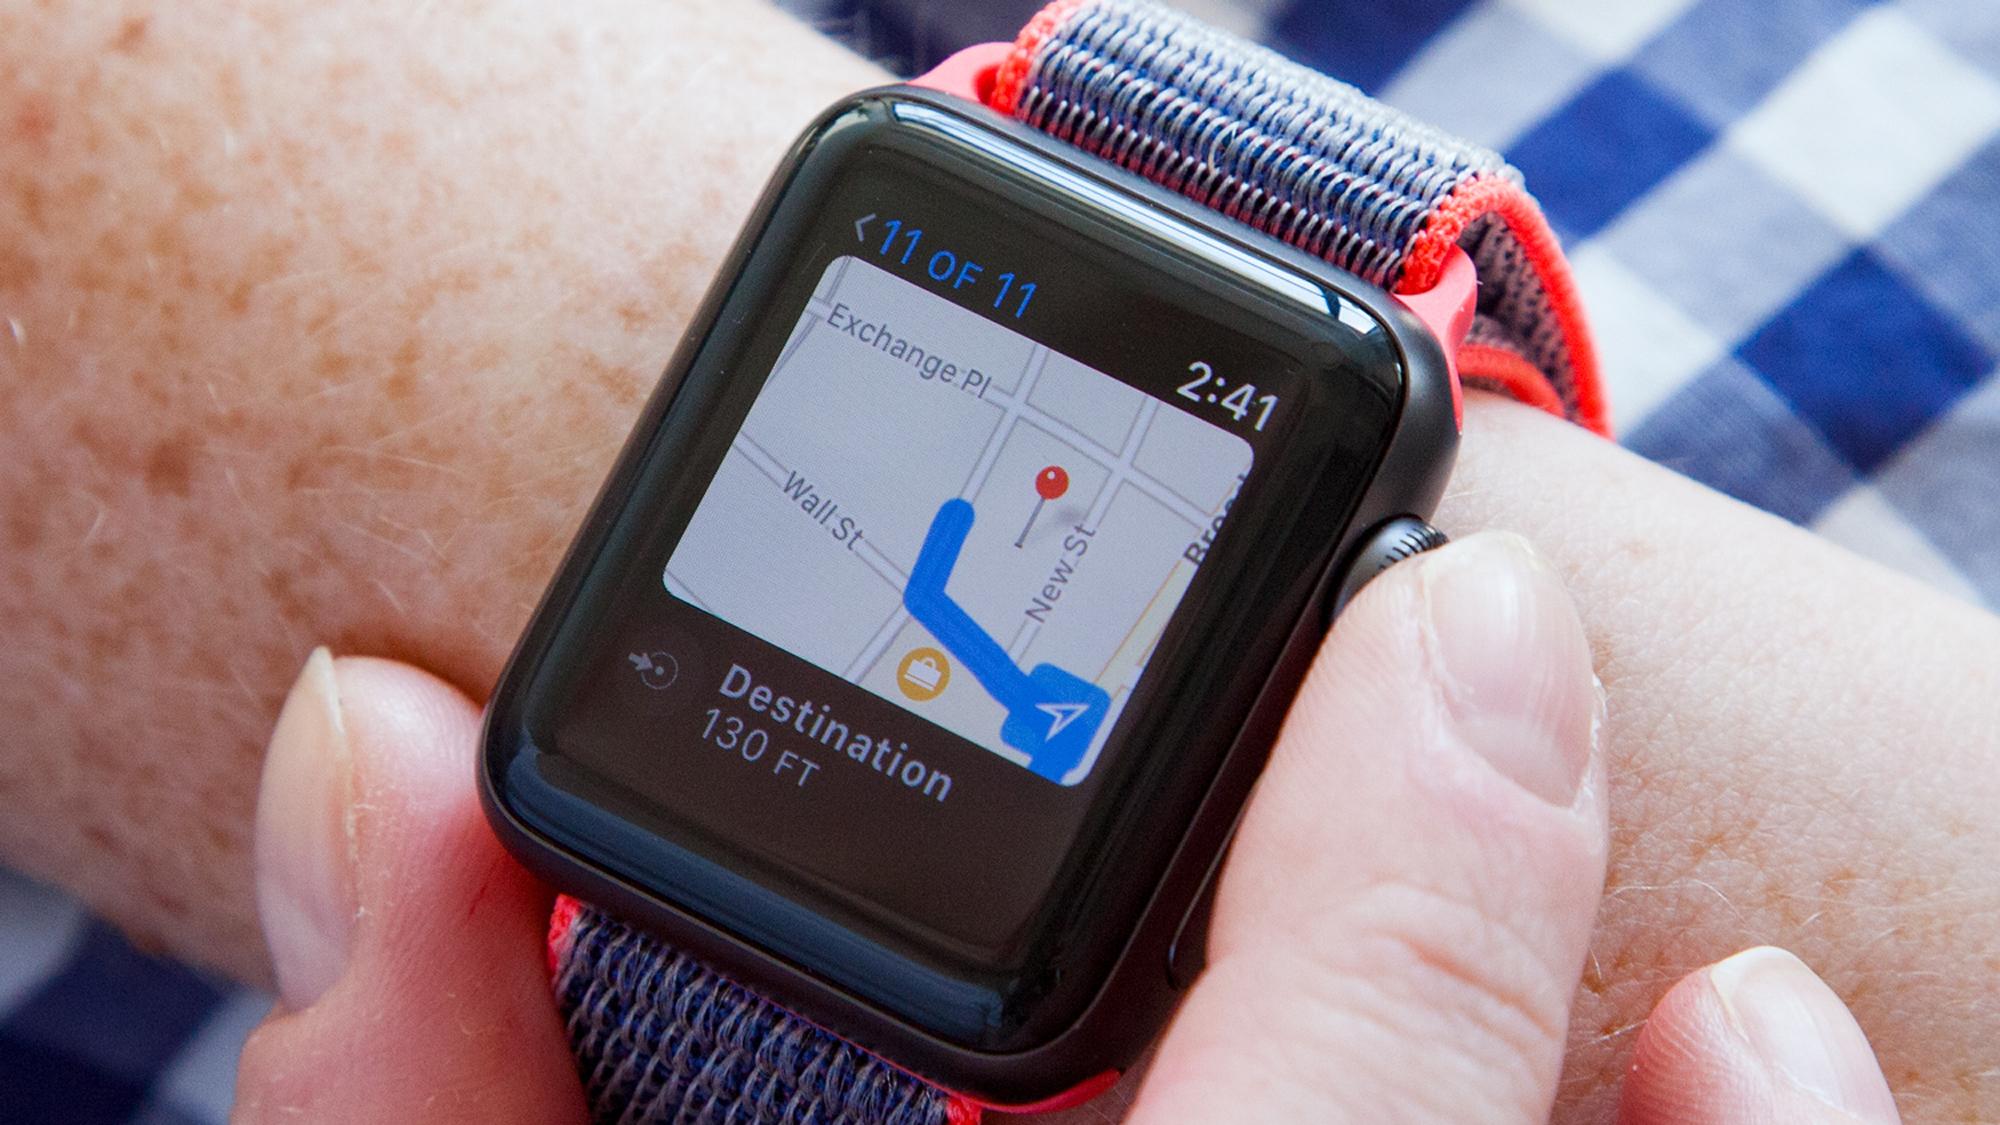 Mejor reloj deportivo: Apple Watch Series 3 (GPS)